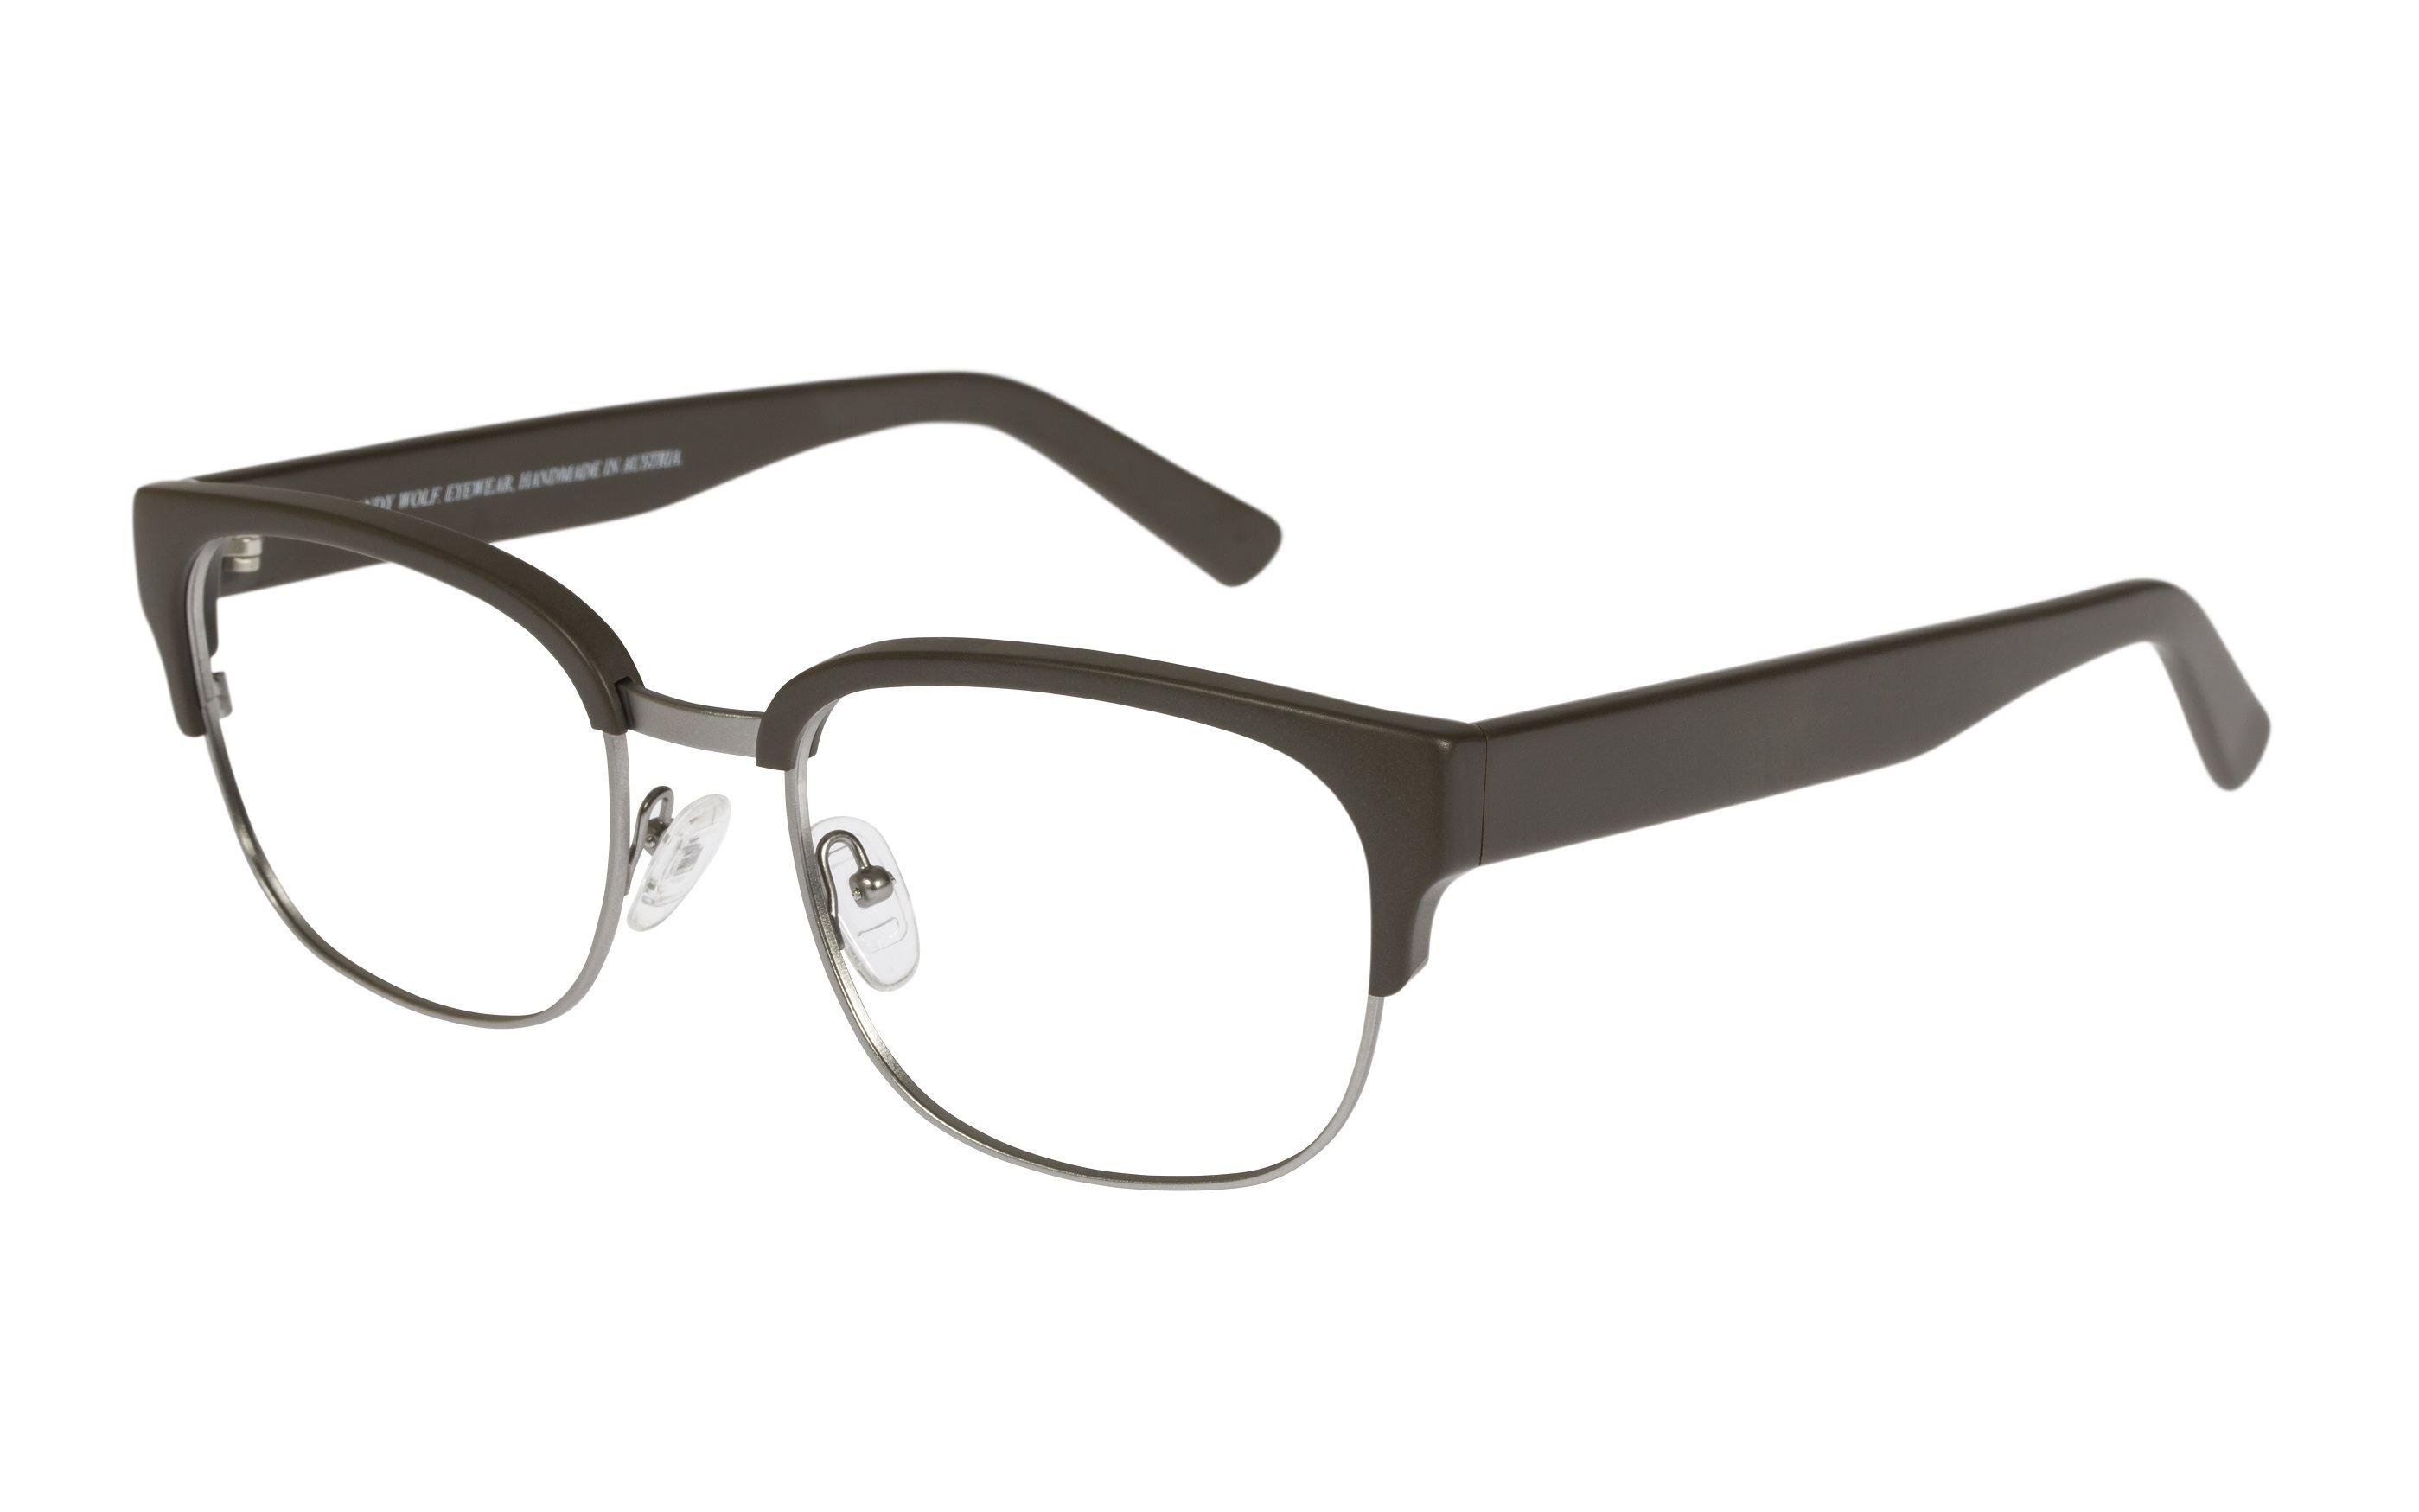 Andy Wolf eyewear Brille handmade AW 4520 e